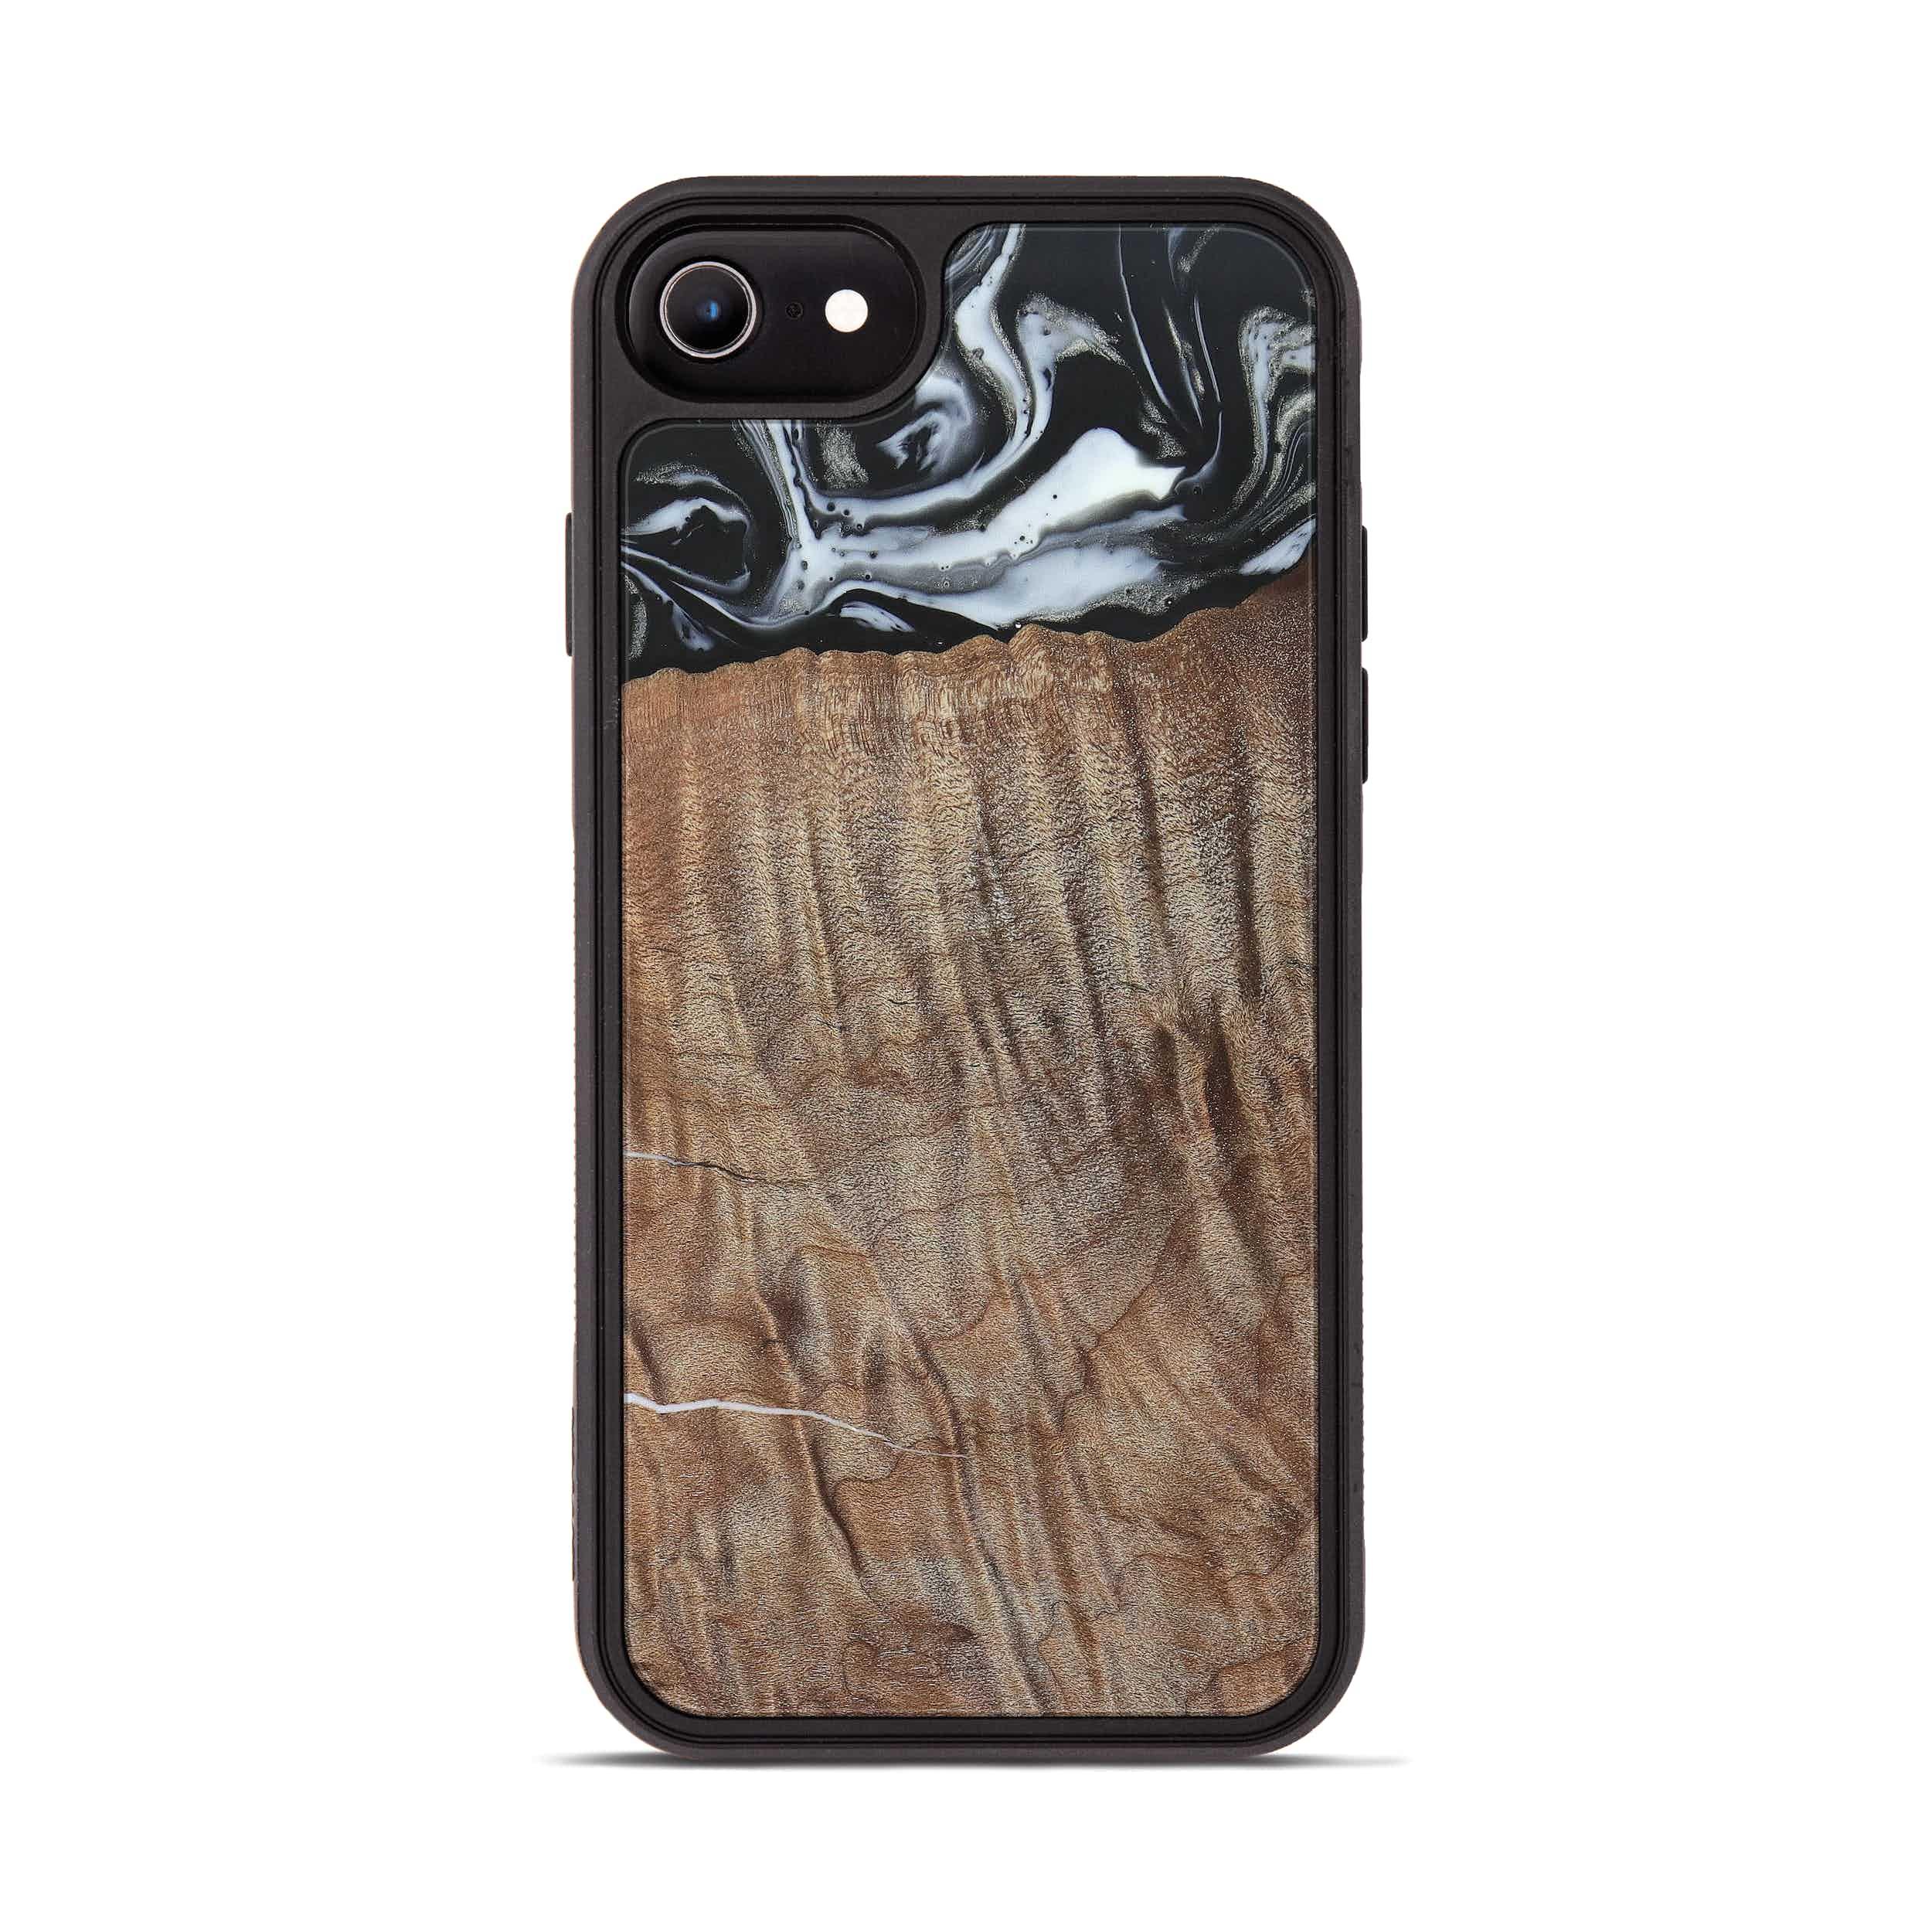 iPhone 8 Wood+Resin Phone Case - Gahn (Black & White, 385912)